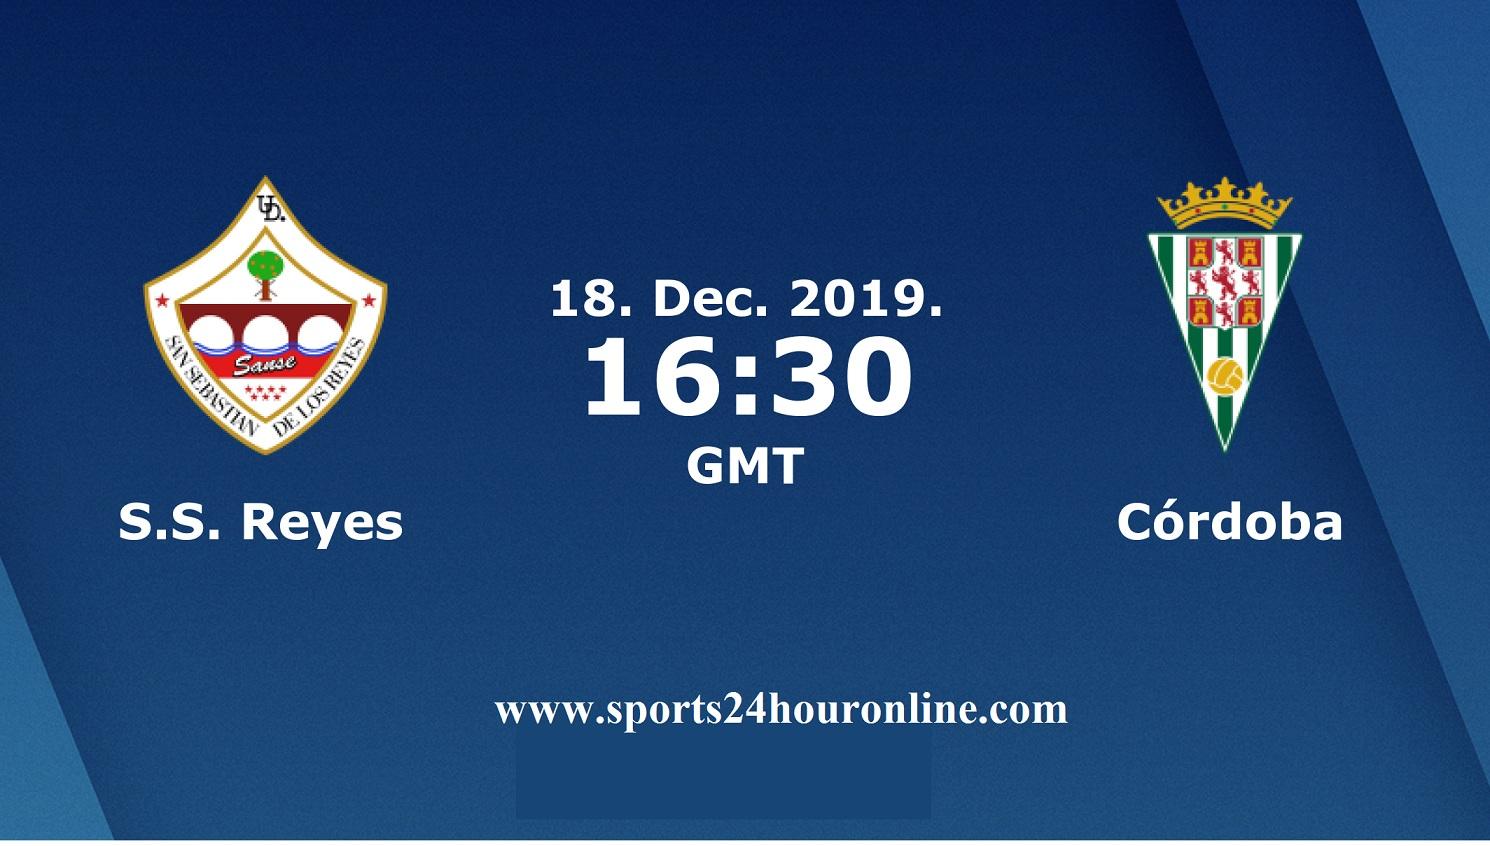 SS REYES vs CORDOBA live stream football match preview & TV Channels